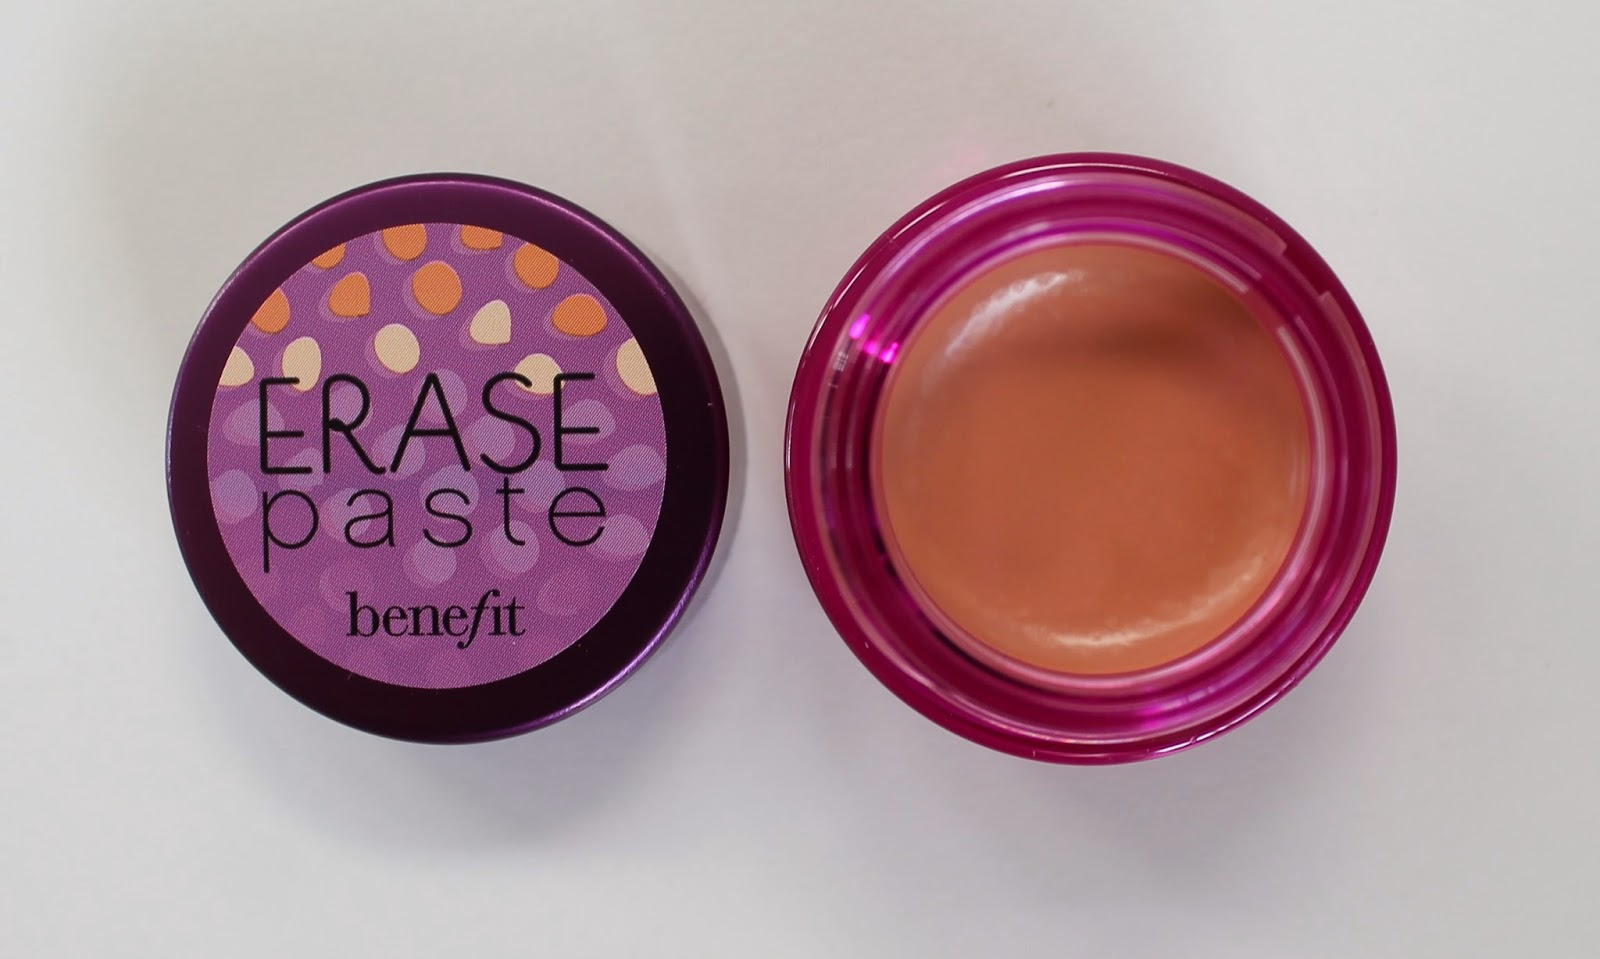 Erase Paste Benefit